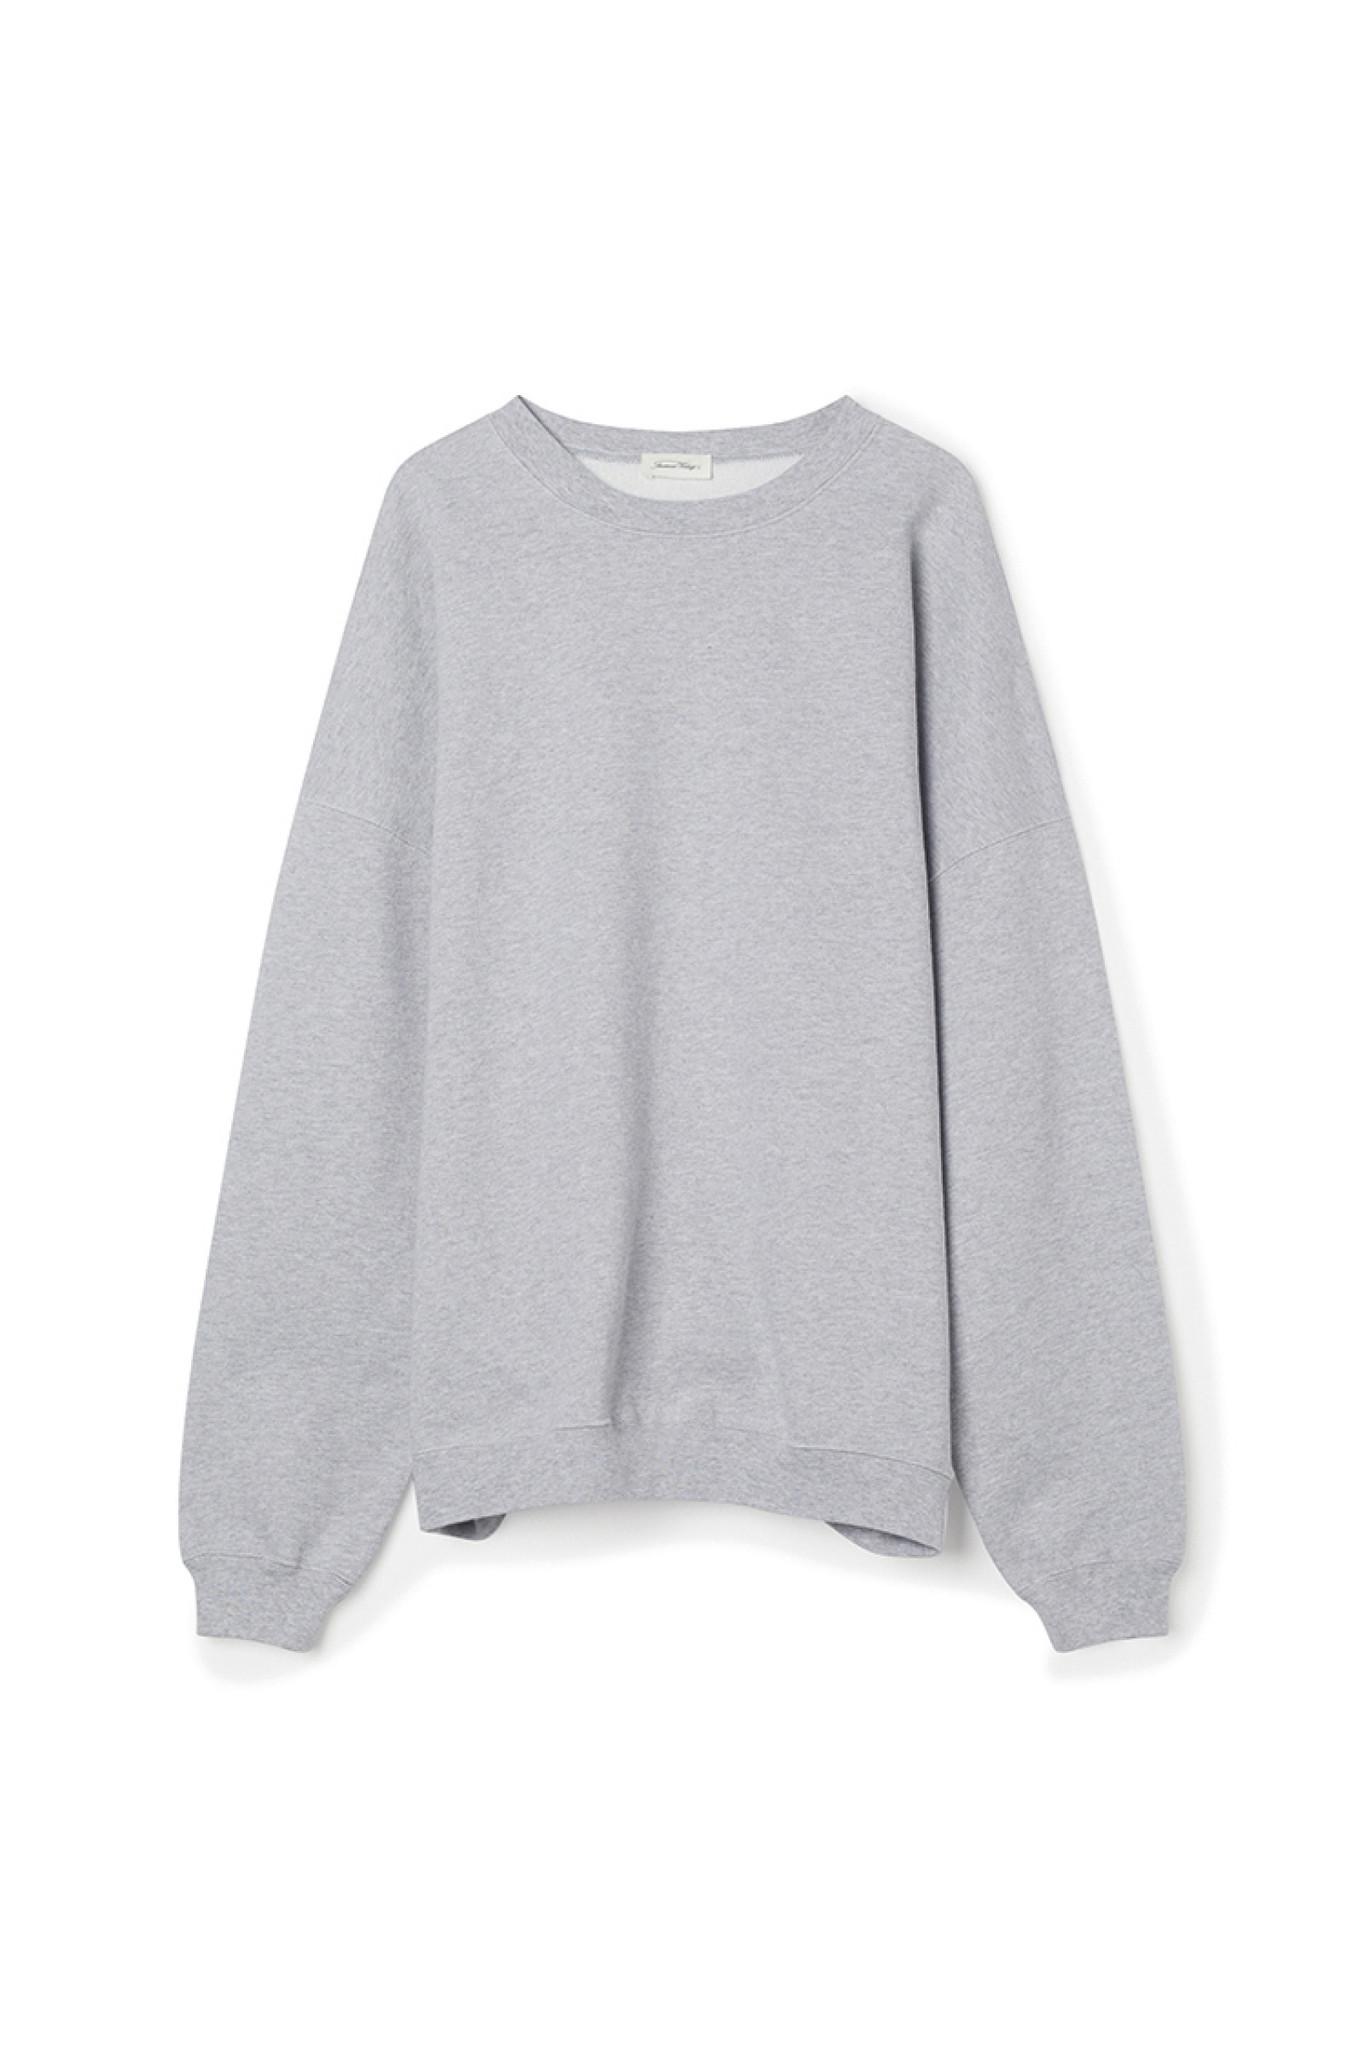 Baetown Sweater - Light Grey Melange-1